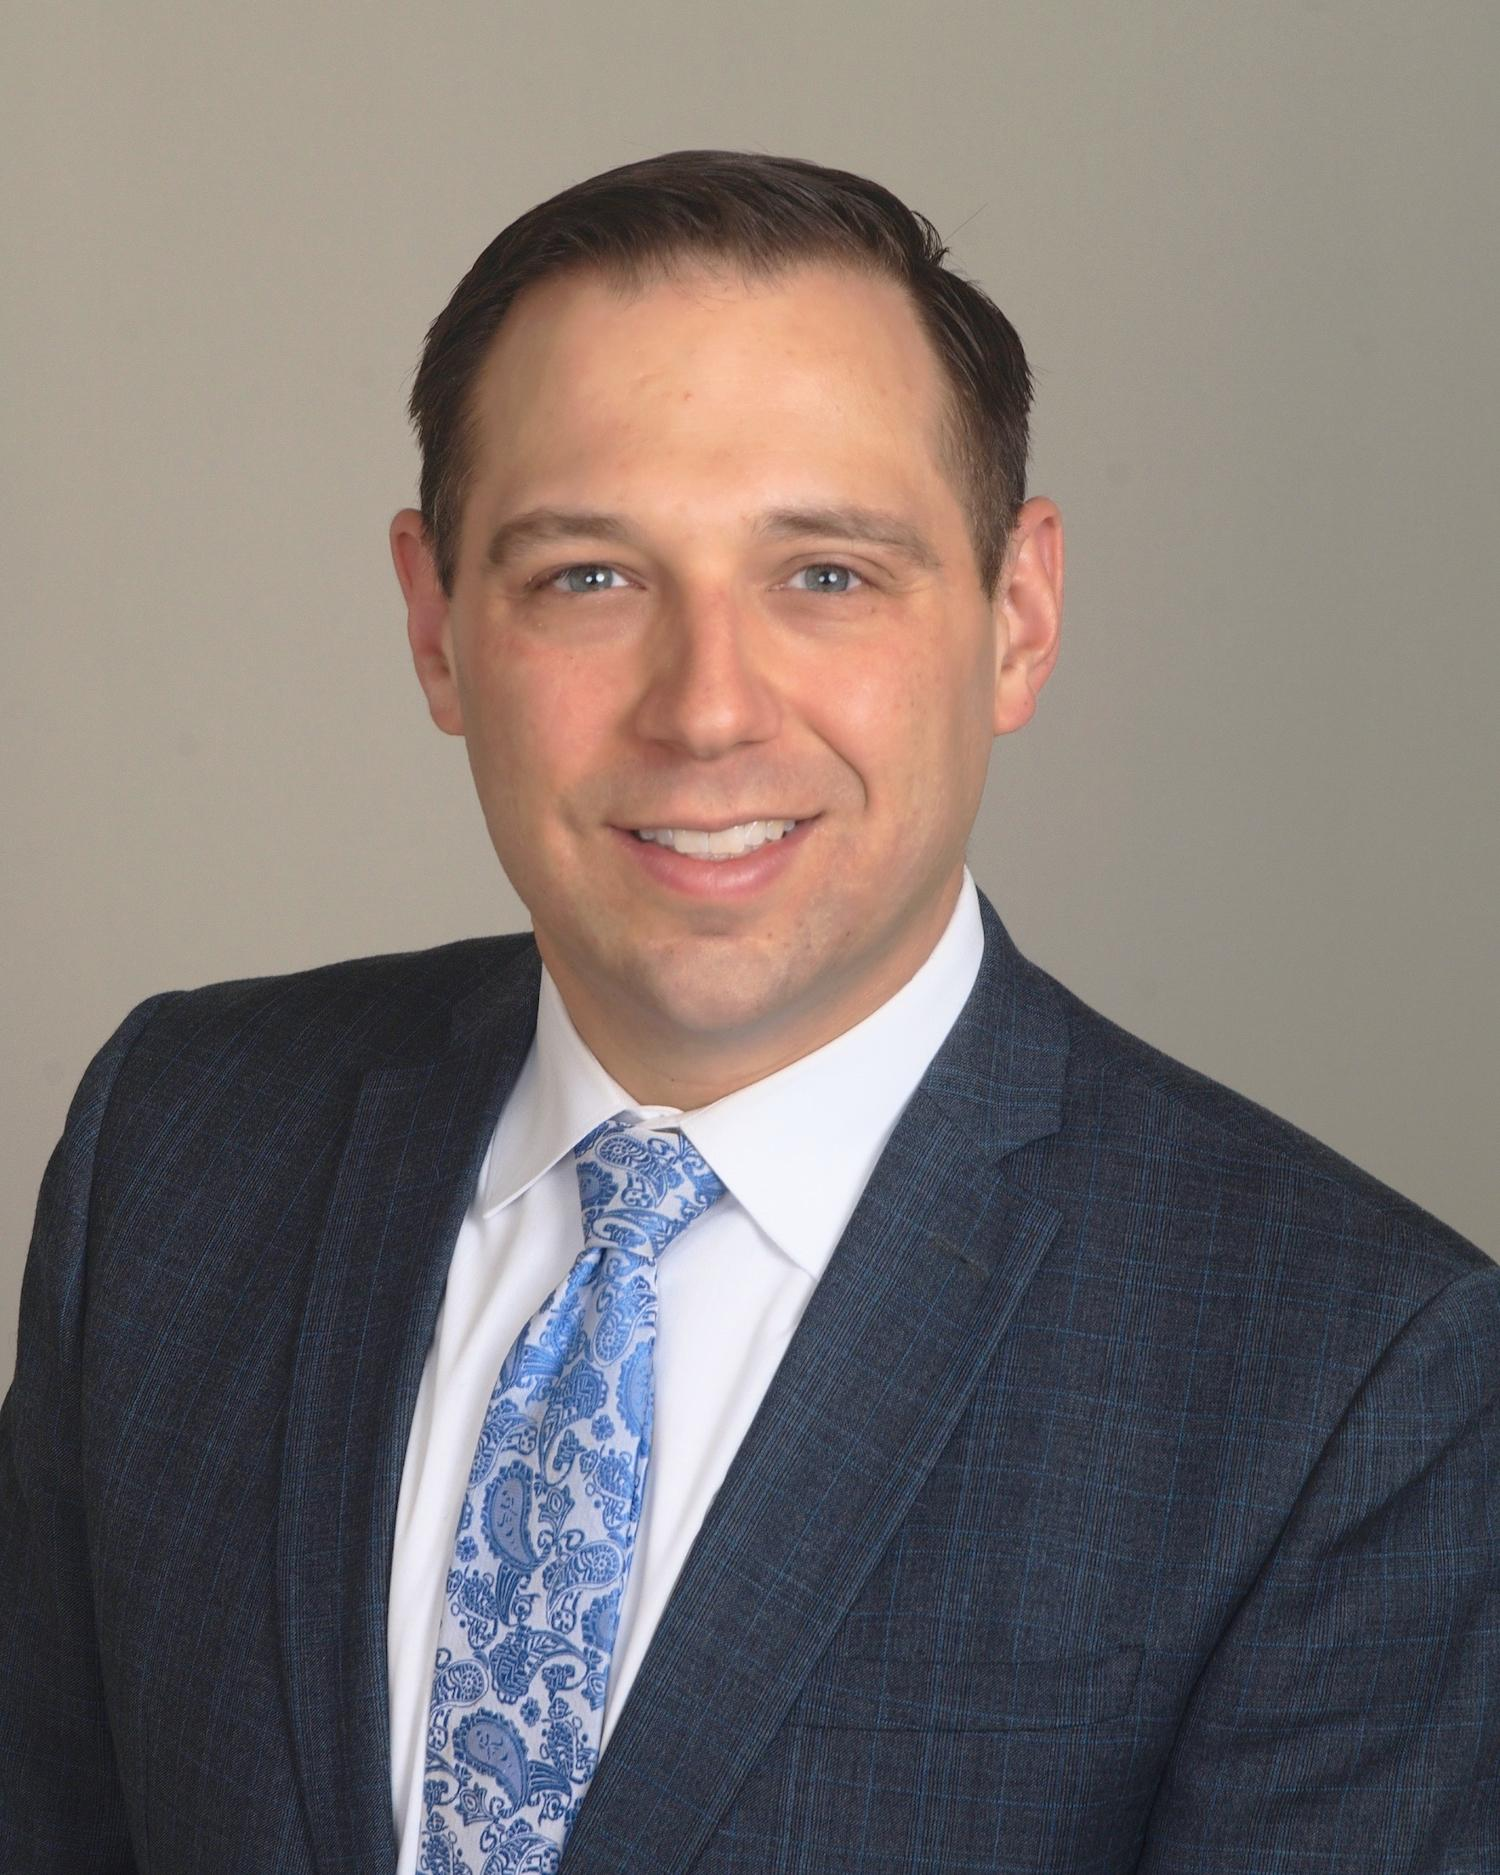 JAMES EISEMAN Financial Advisor